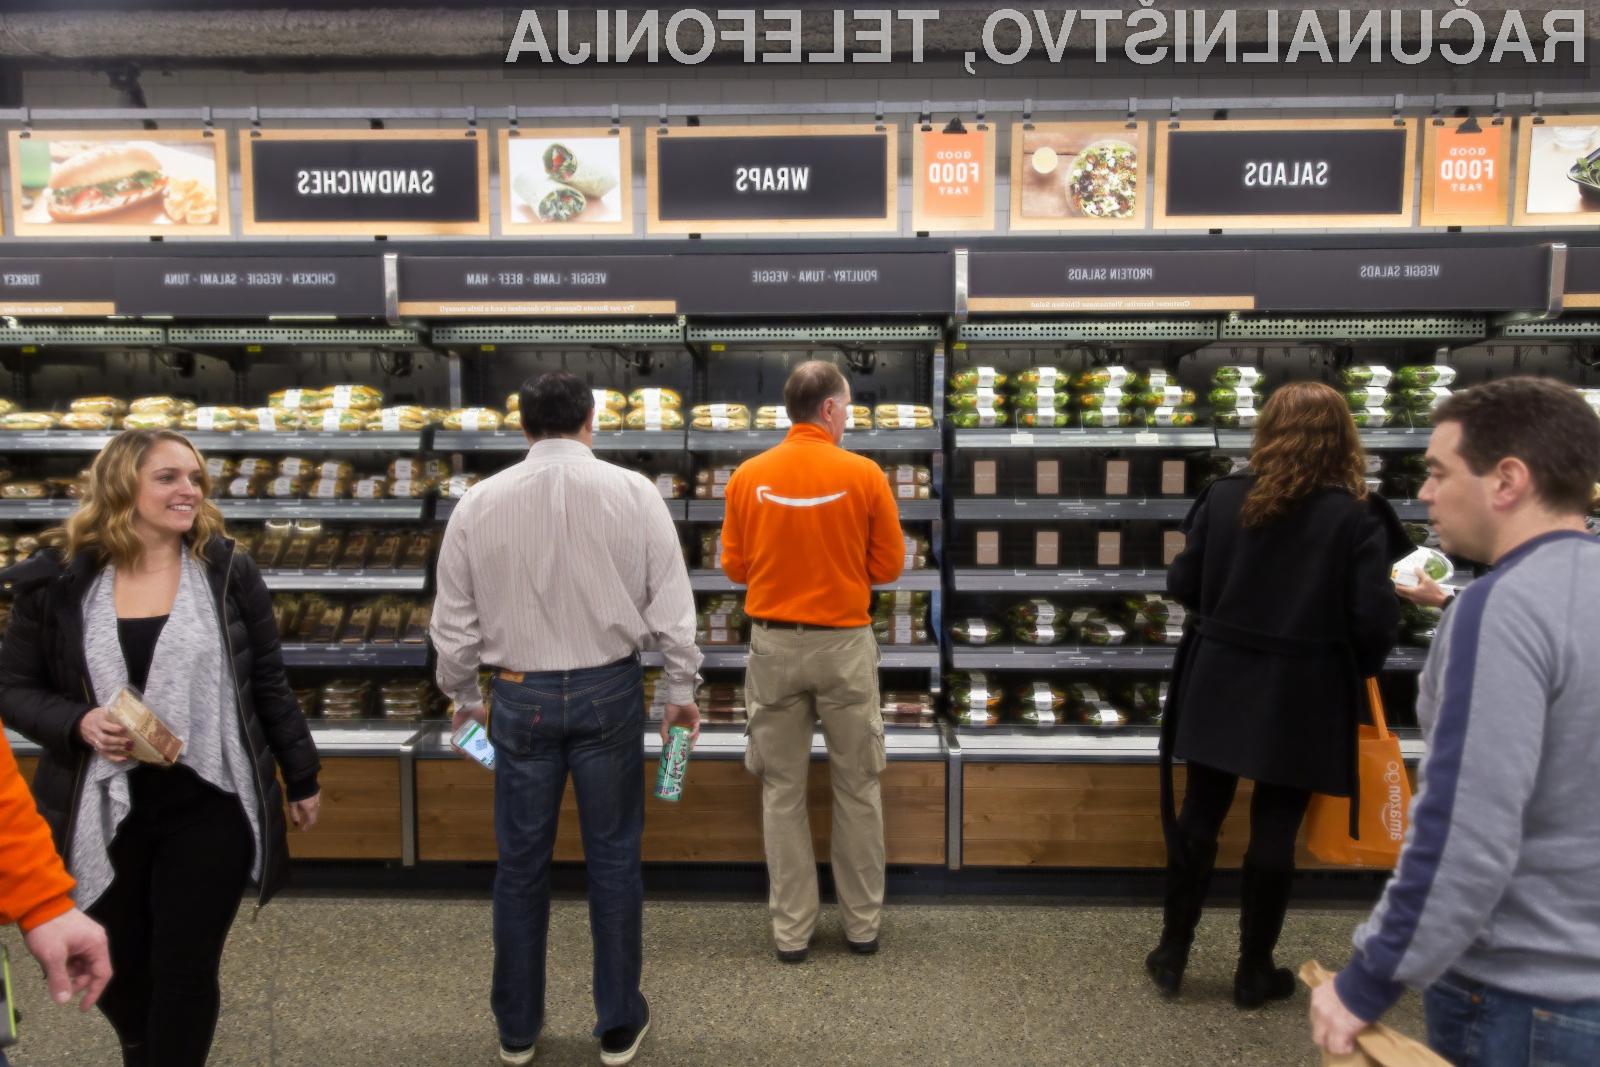 Futuristična trgovina Amazon Go je končno na voljo običajnim kupcem.